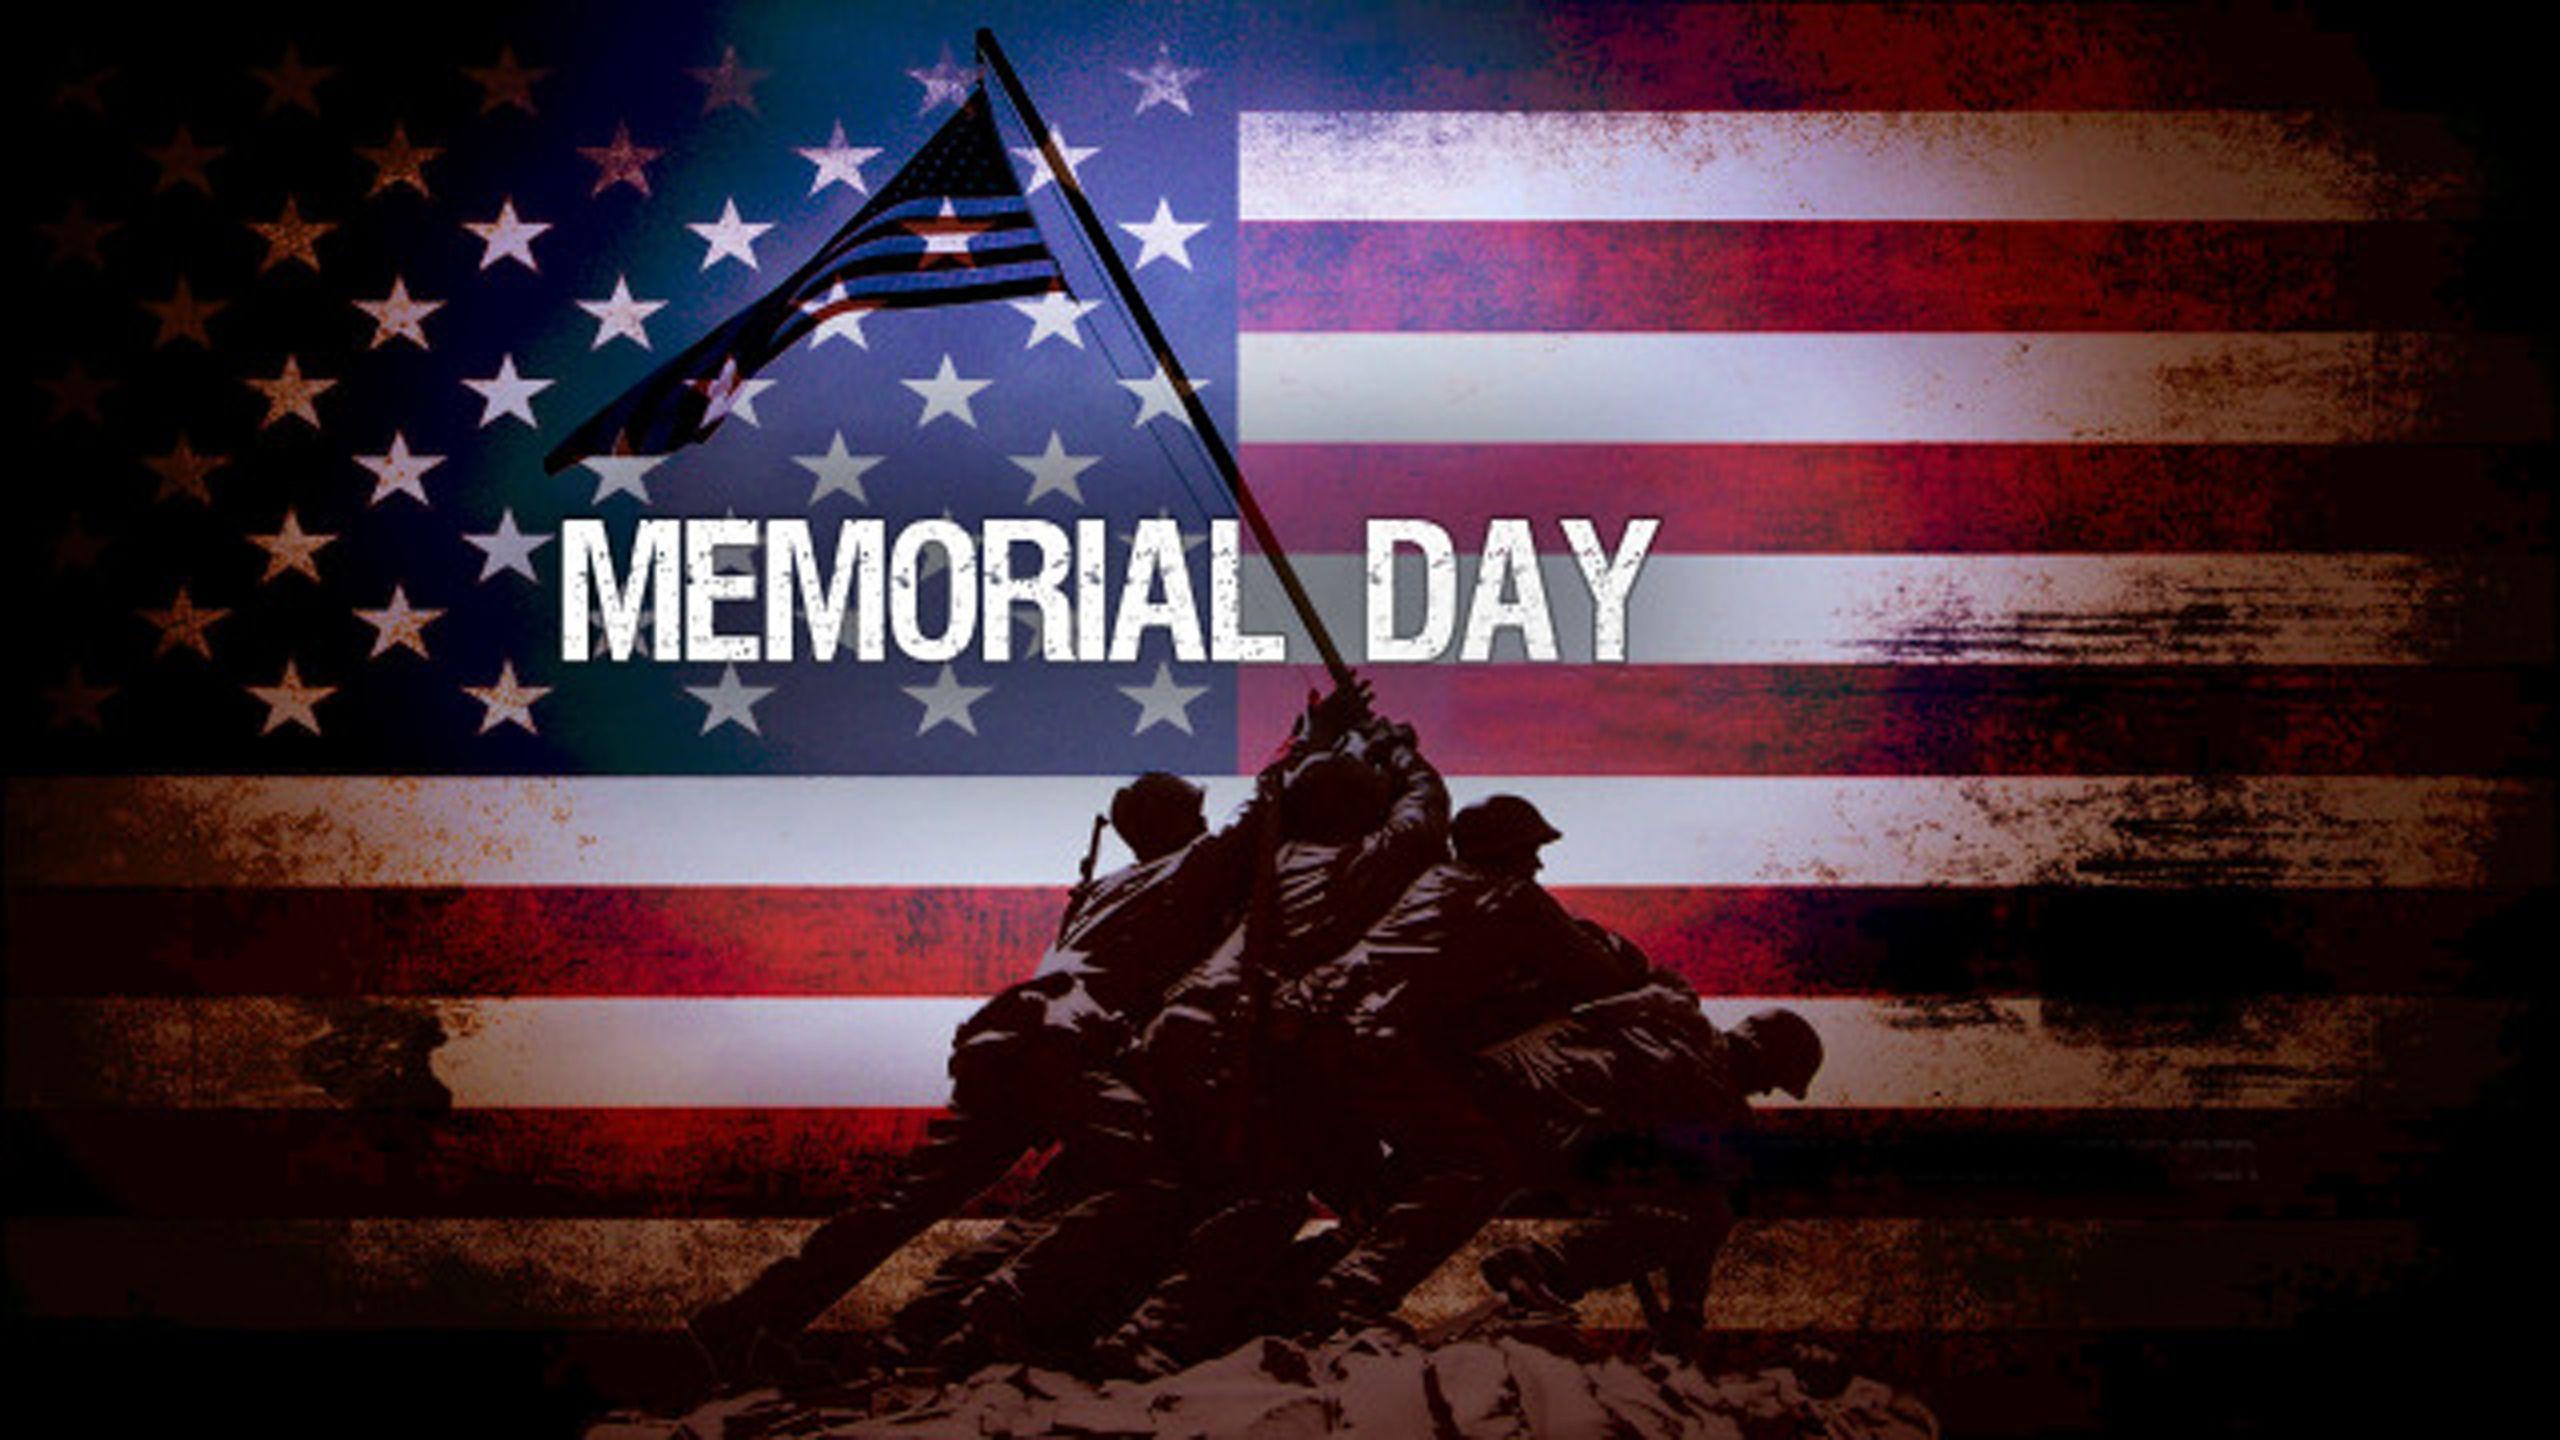 Memorial day poems veterans poems prayers - Explore Memorial Day Quotes Happy Memorial Day And More